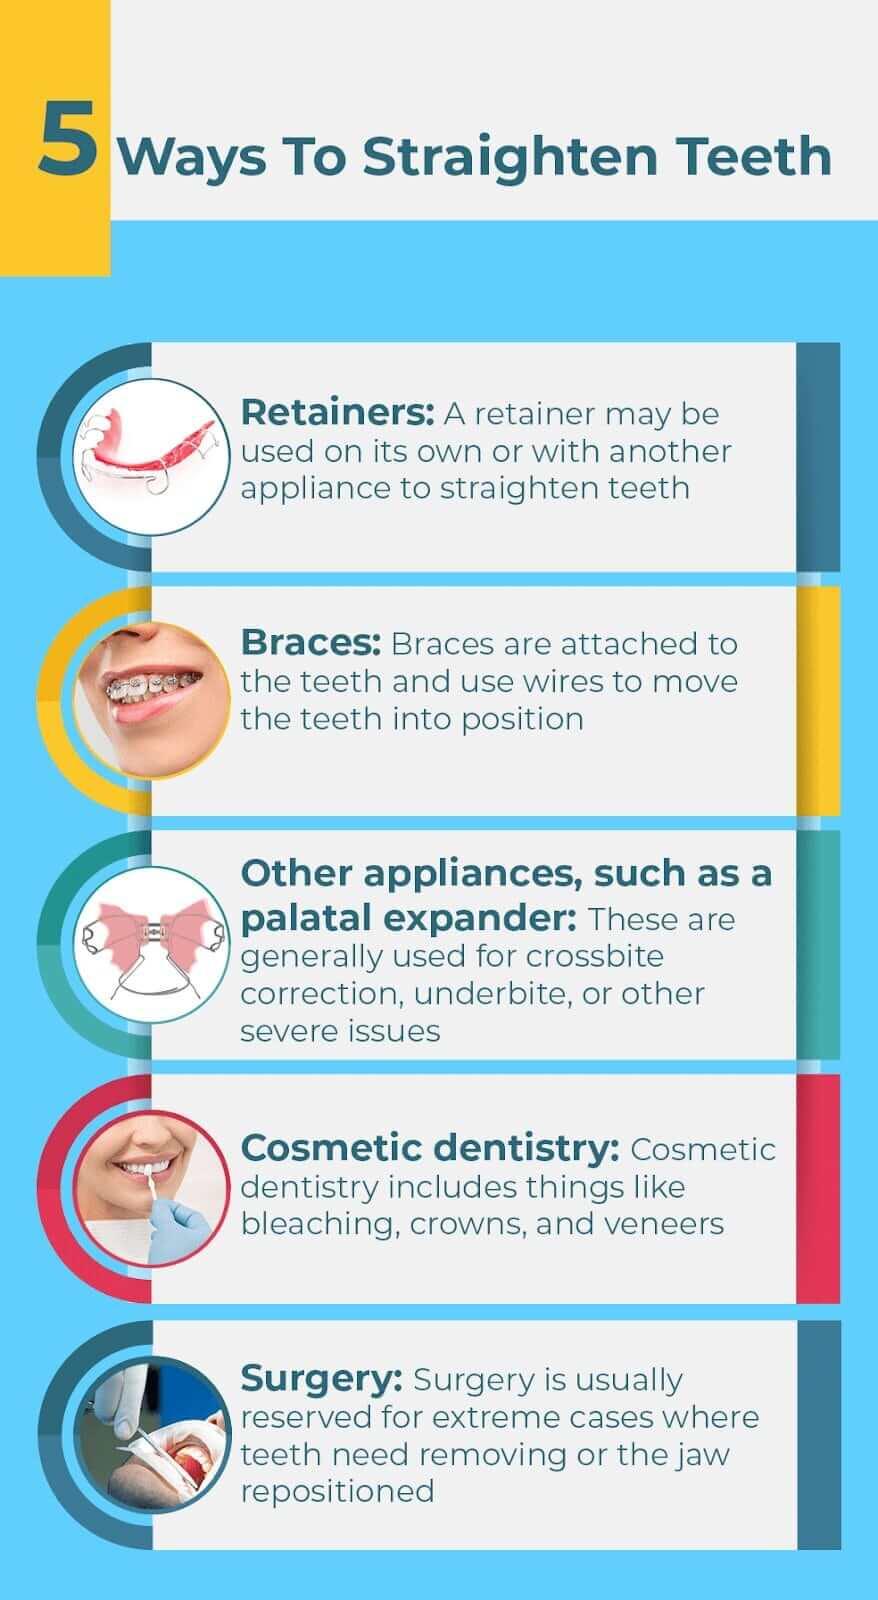 straightening teeth naturally